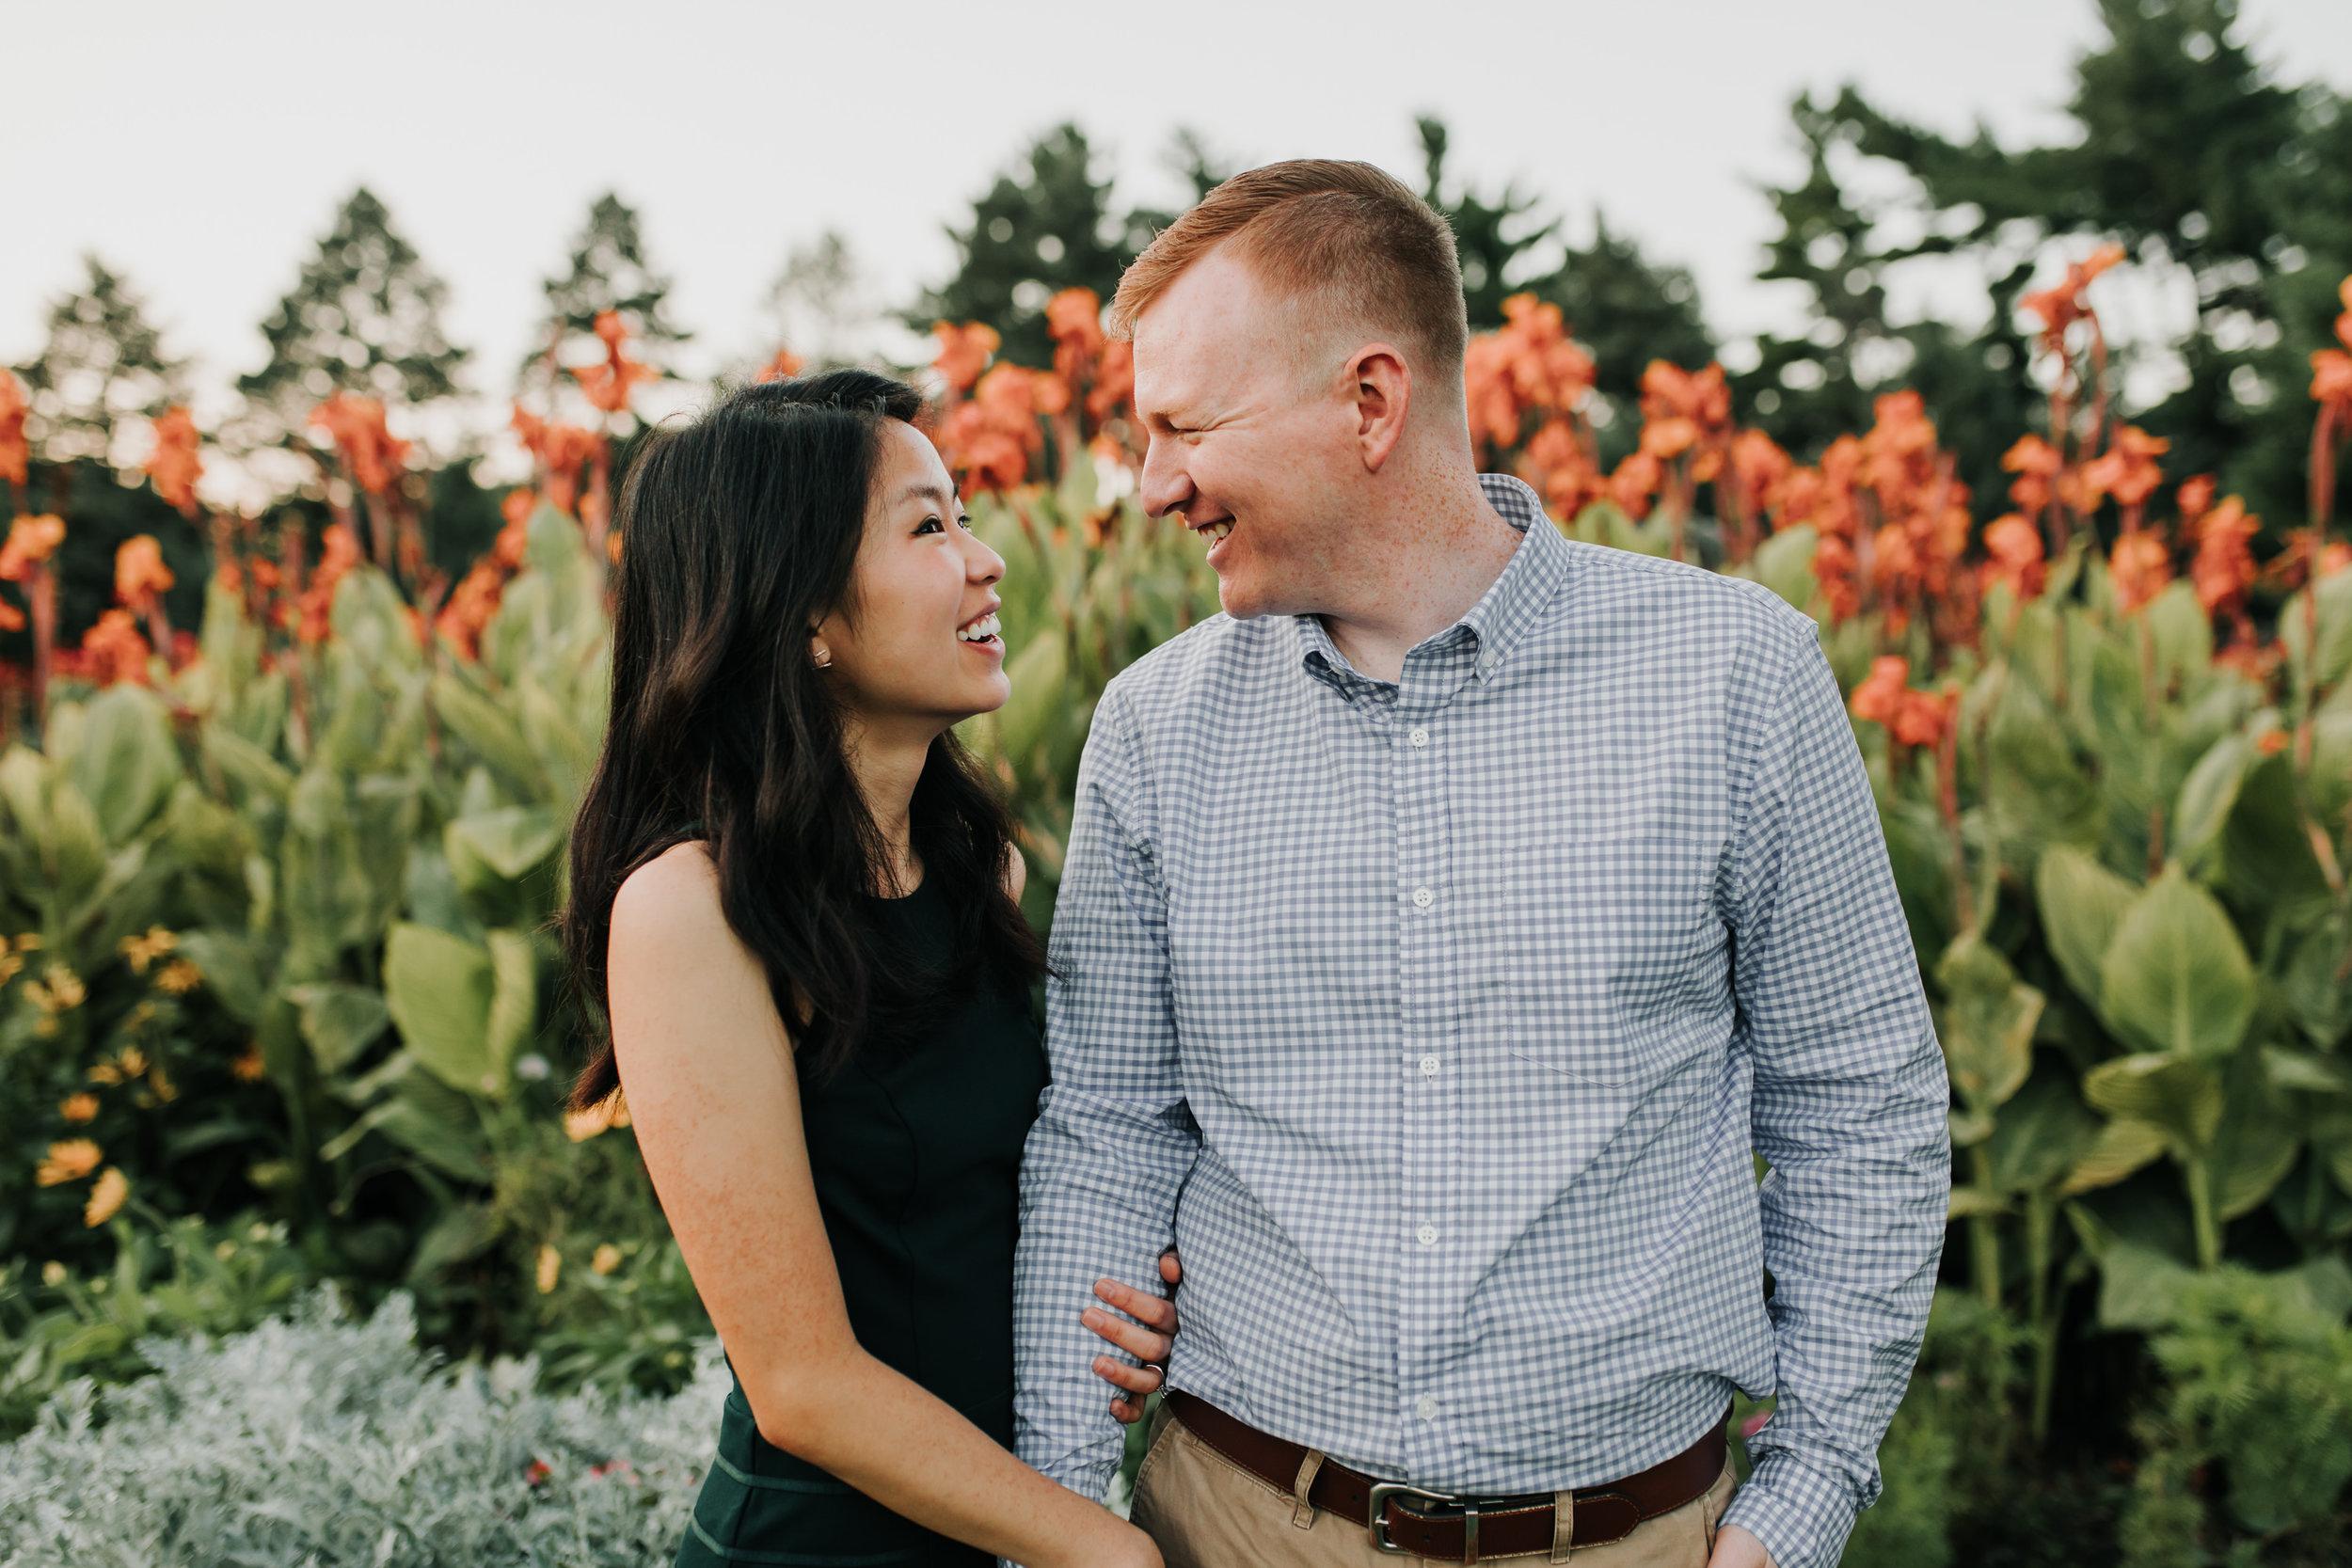 Catherin & Kyle - Married - Nathaniel Jensen Photography - Omaha Nebraska Wedding Photograper - Memorial Park - Joslyn Castle Engagement Session-84.jpg